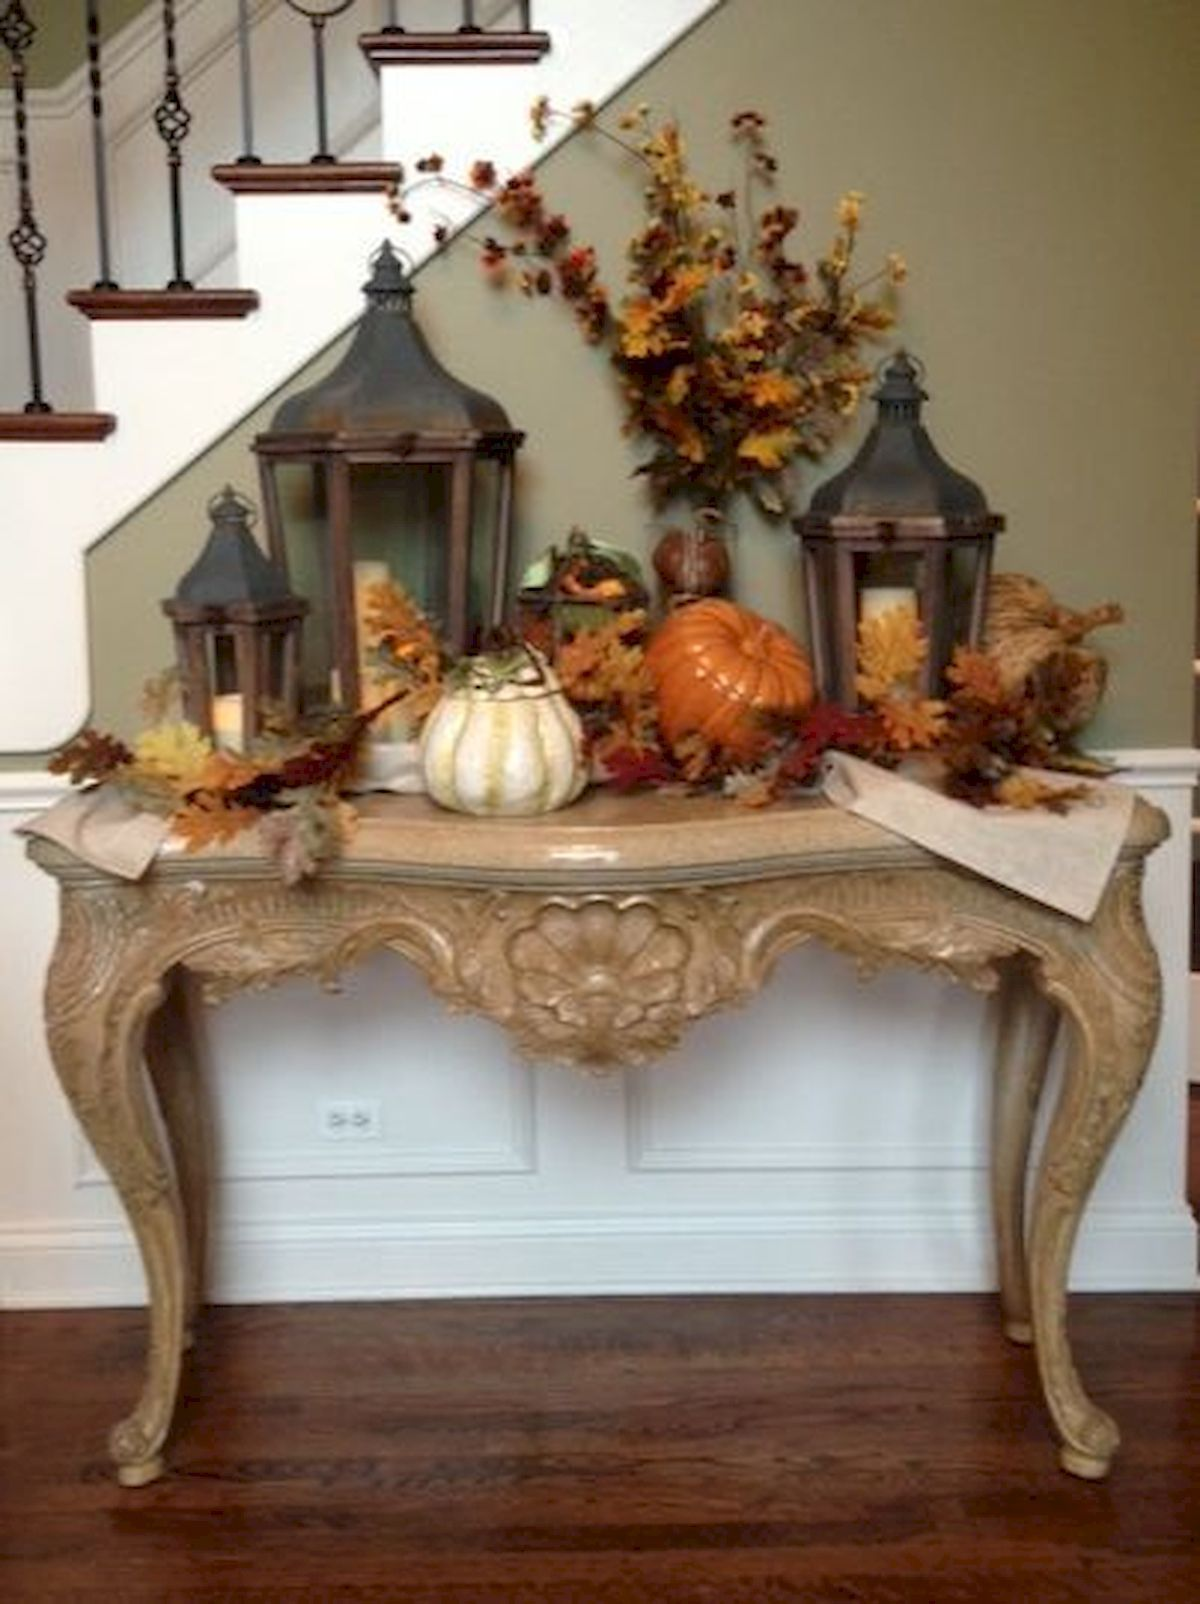 Cautious Wooden Furniture Living Room #homecooking #HomeFurnitureModern #fallmantledecor